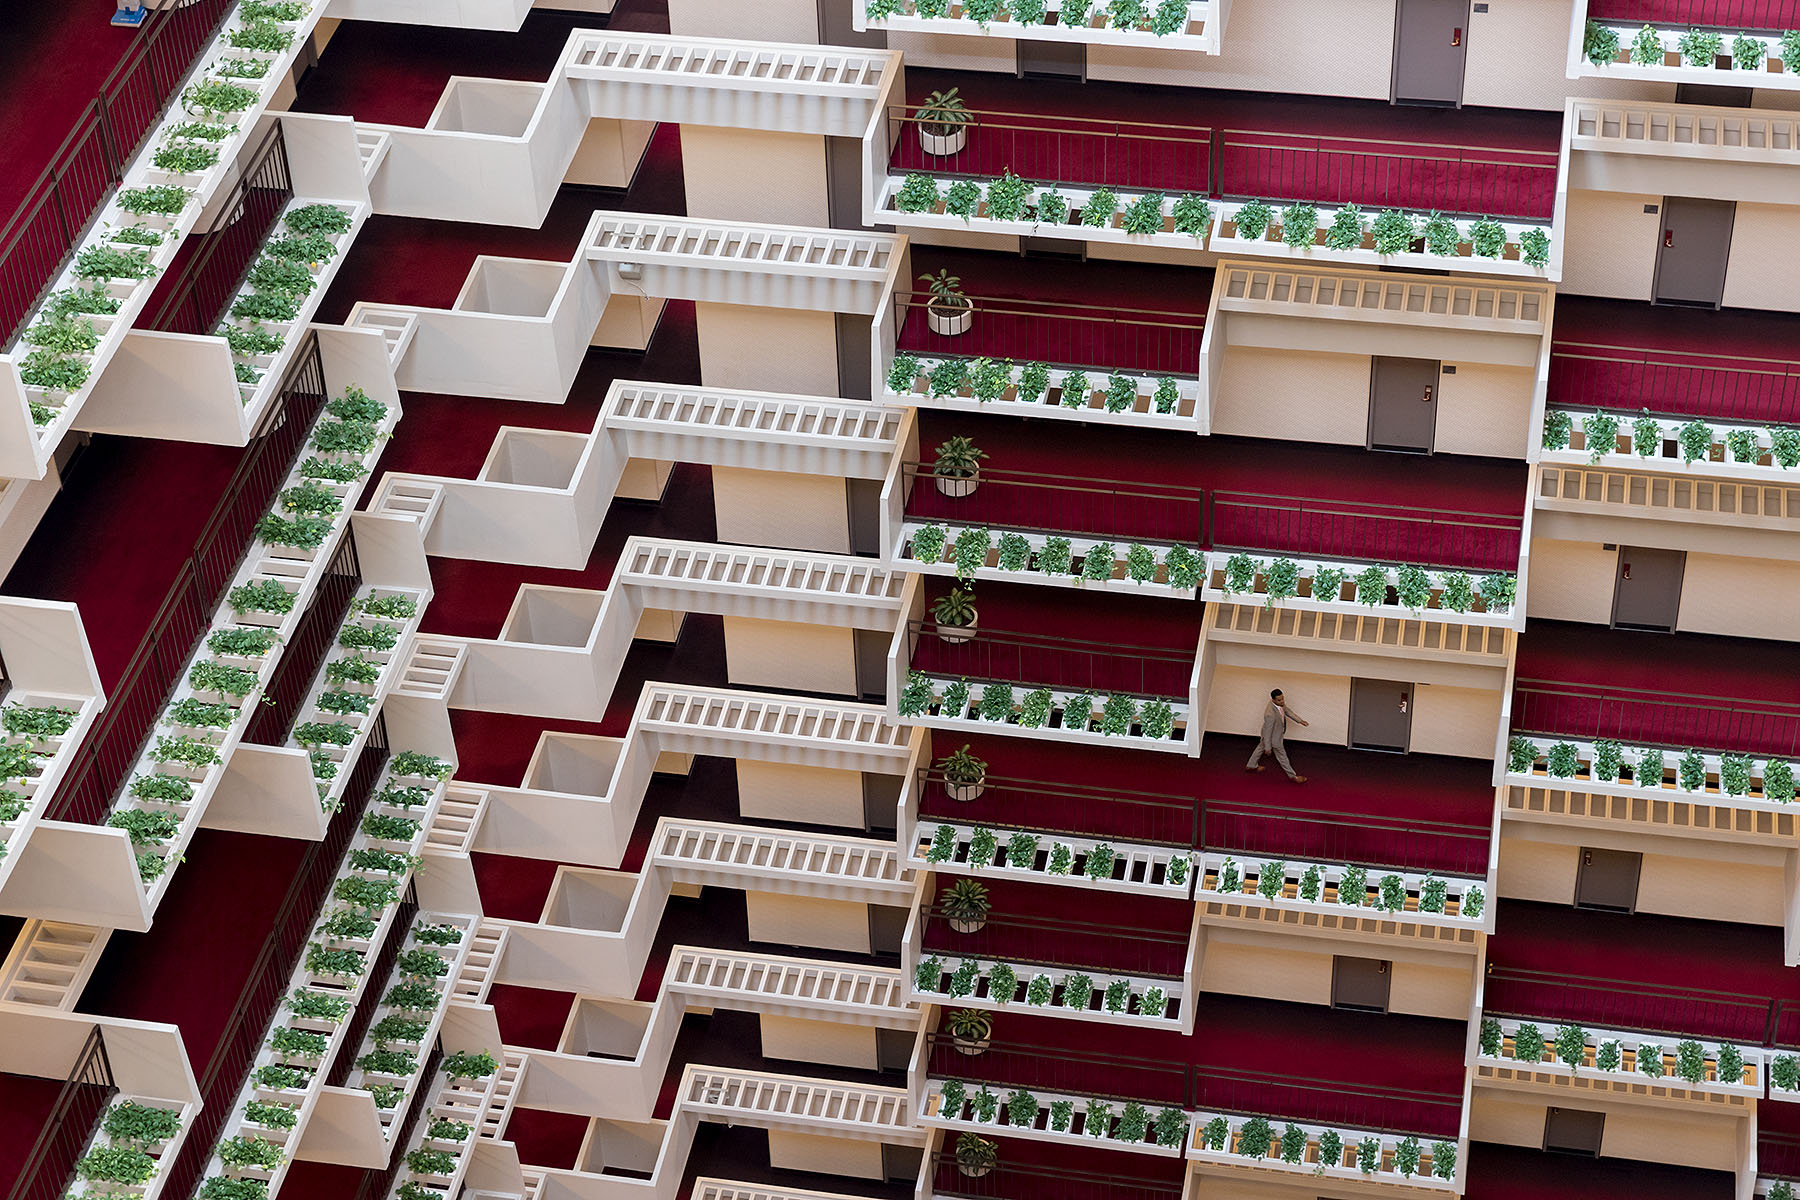 interior of a hotel atrium